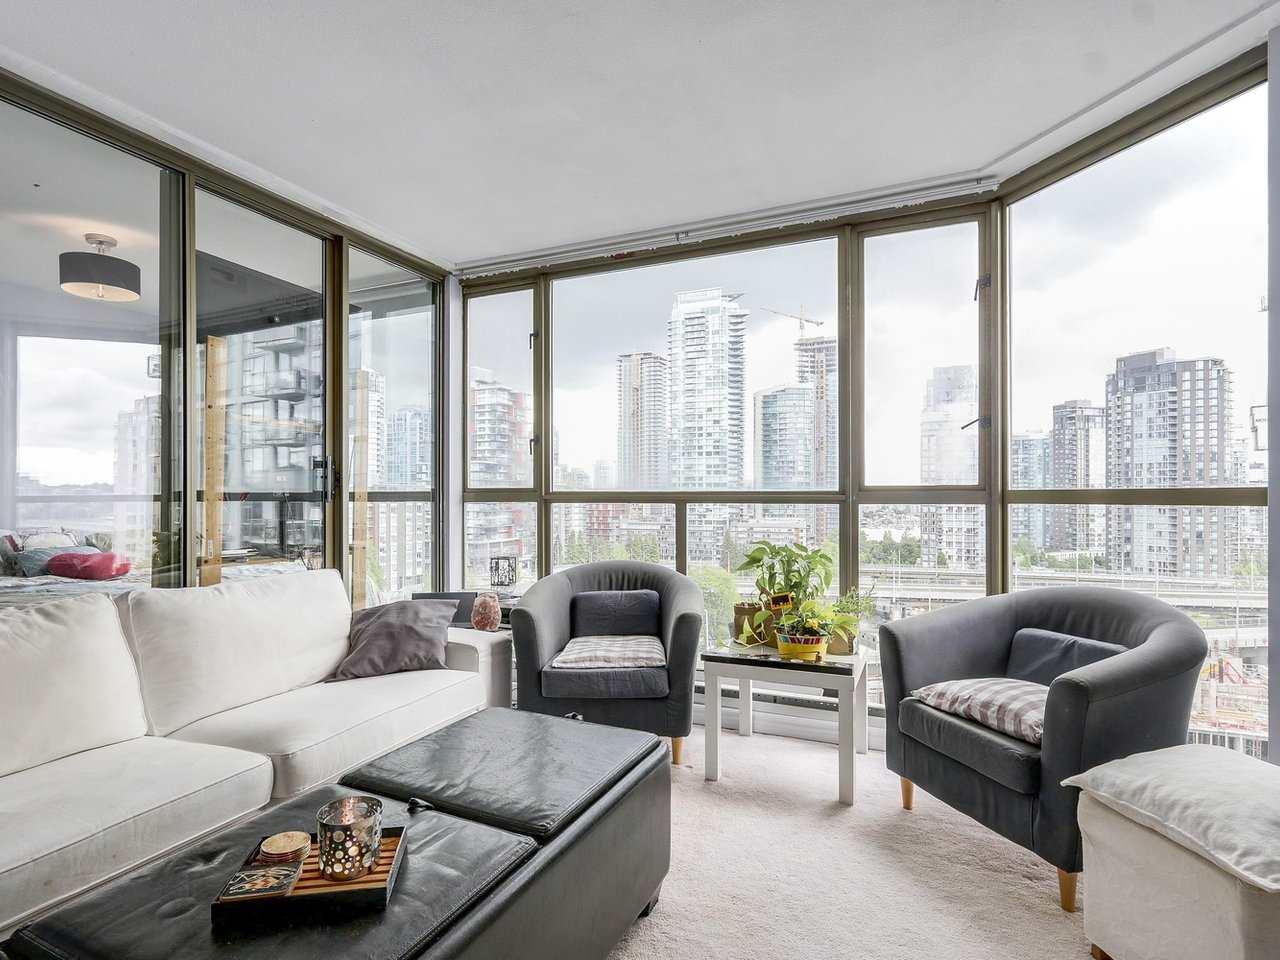 Condo Apartment at 1202 888 PACIFIC STREET, Unit 1202, Vancouver West, British Columbia. Image 1